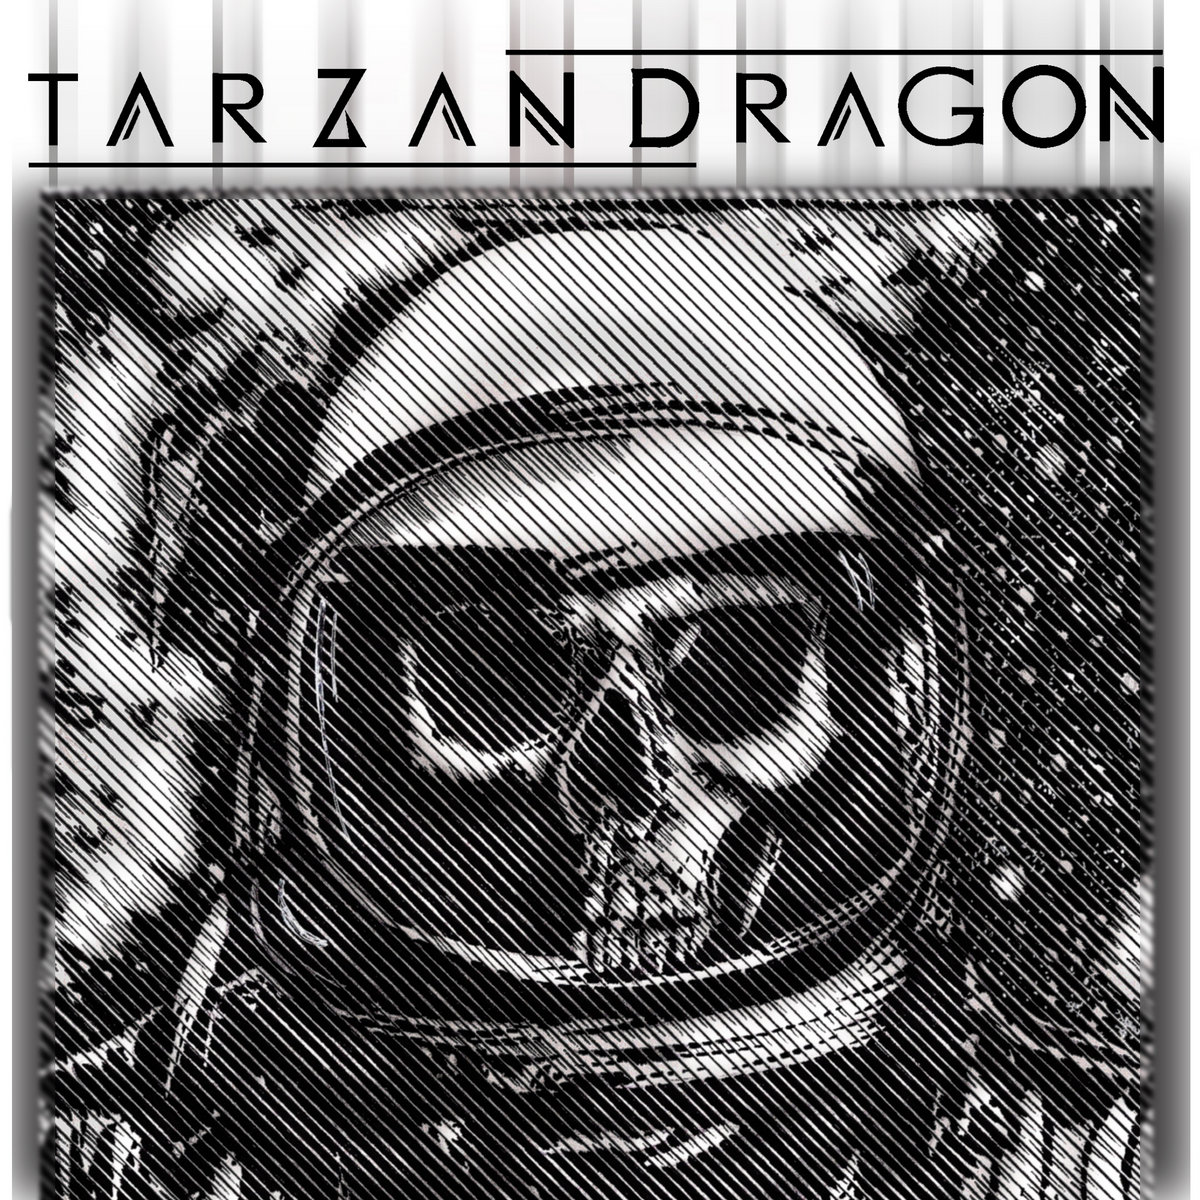 www.facebook.com/tarzandragon